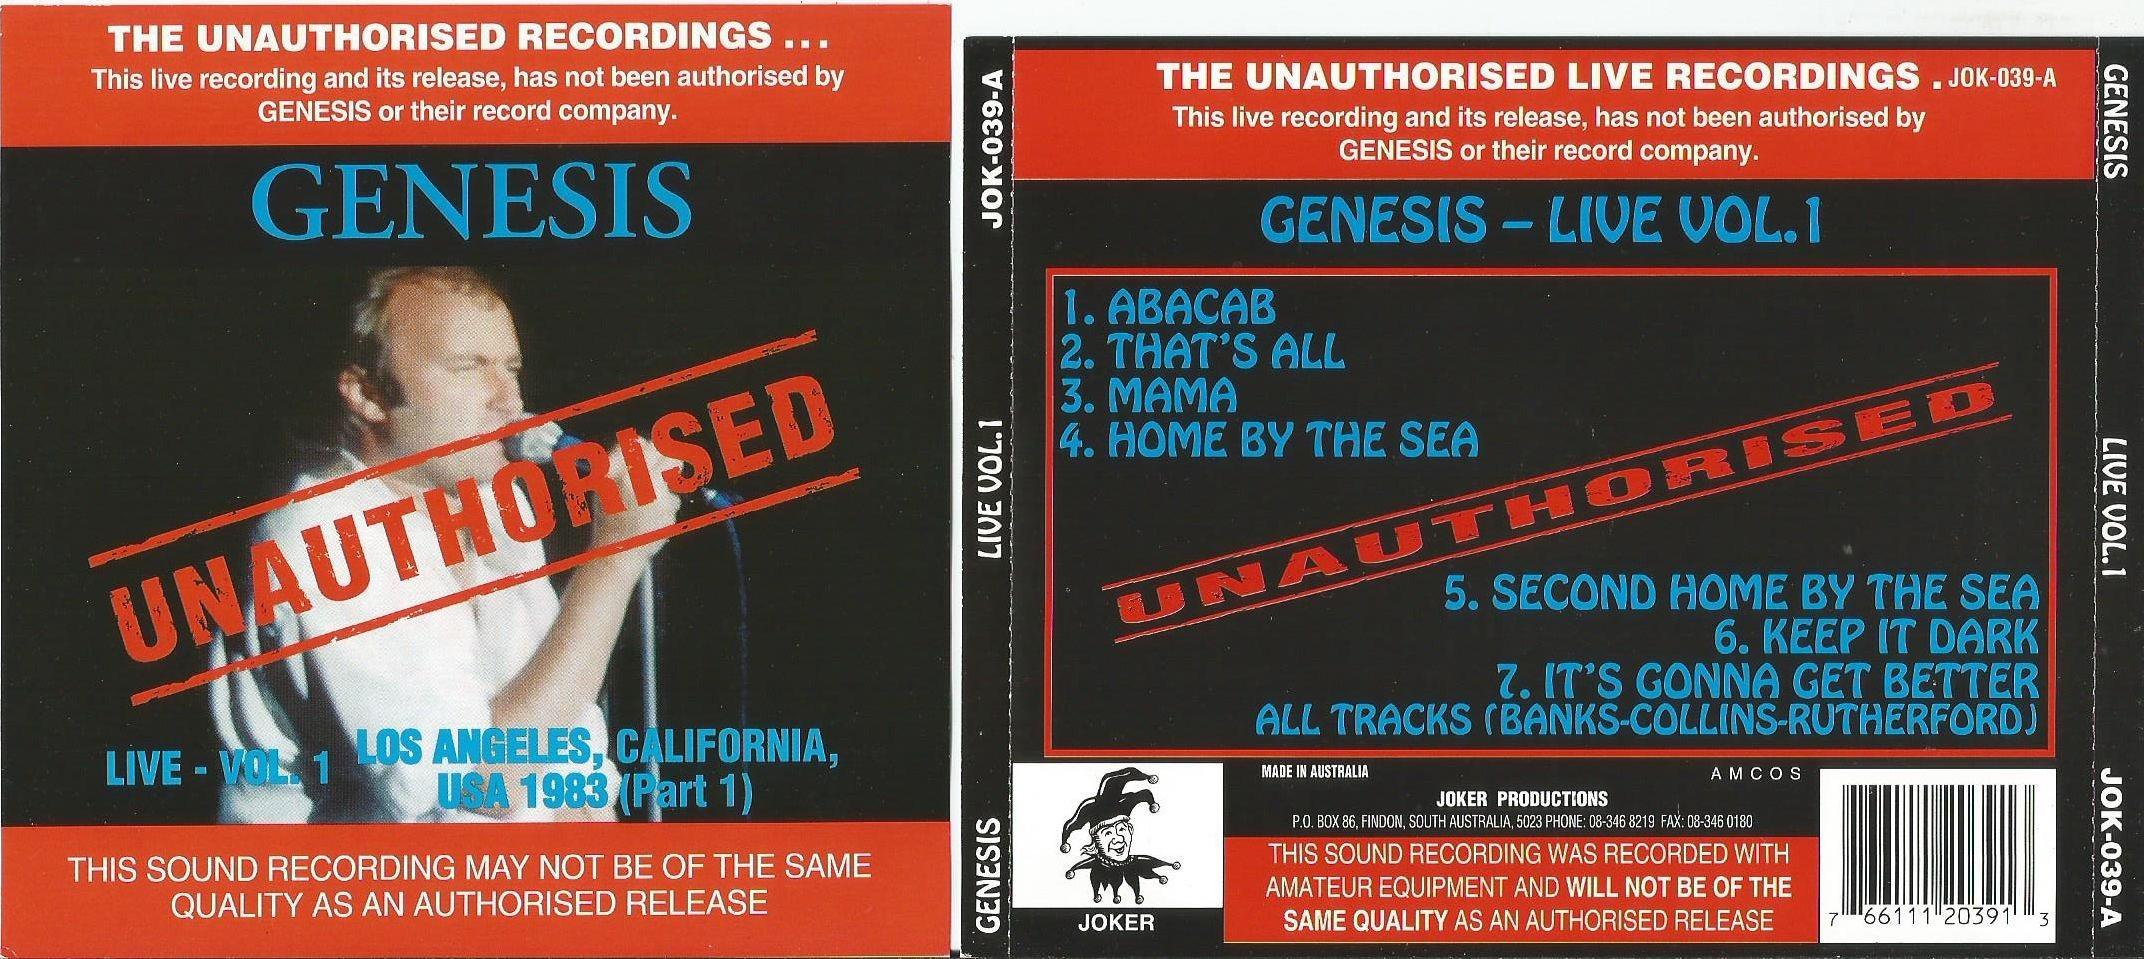 Live vol  1 (los angeles, ca, usa 1983 part 1)(soundboard) de Genesis, CD  chez apexmusic